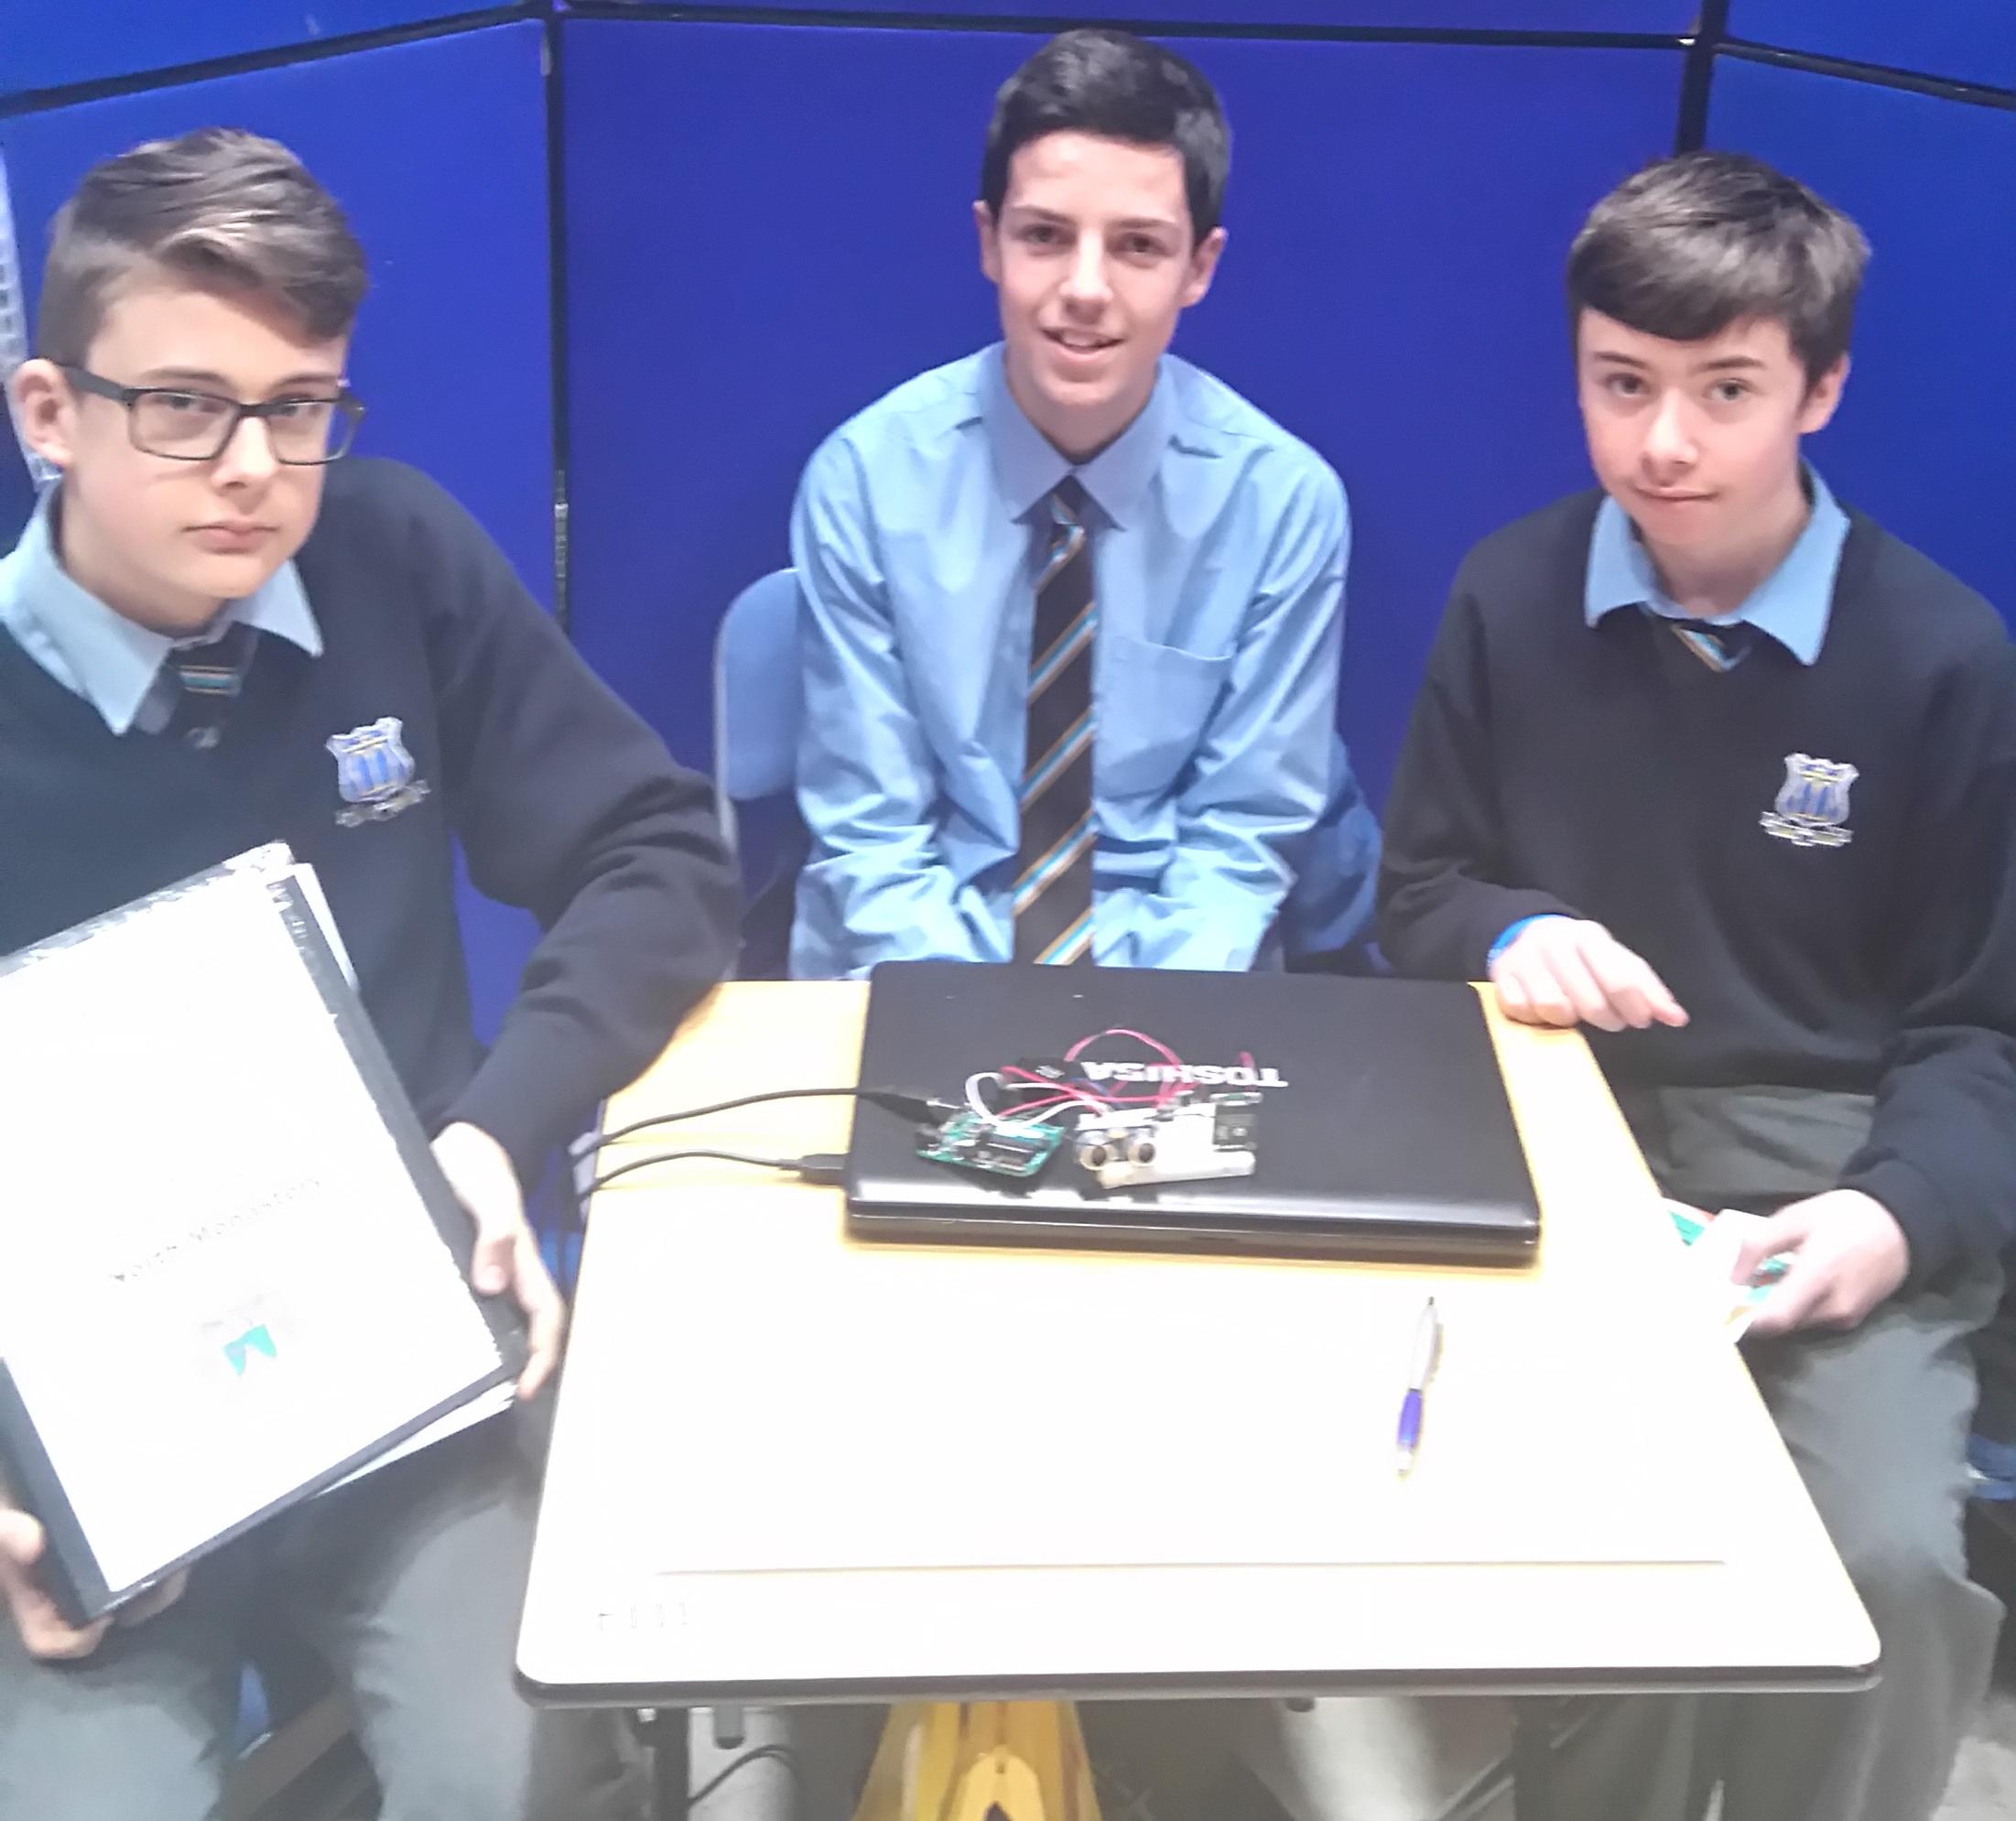 SciFest 2016 Kacper Zelechowski, Liam Donovan, Kyle Daly